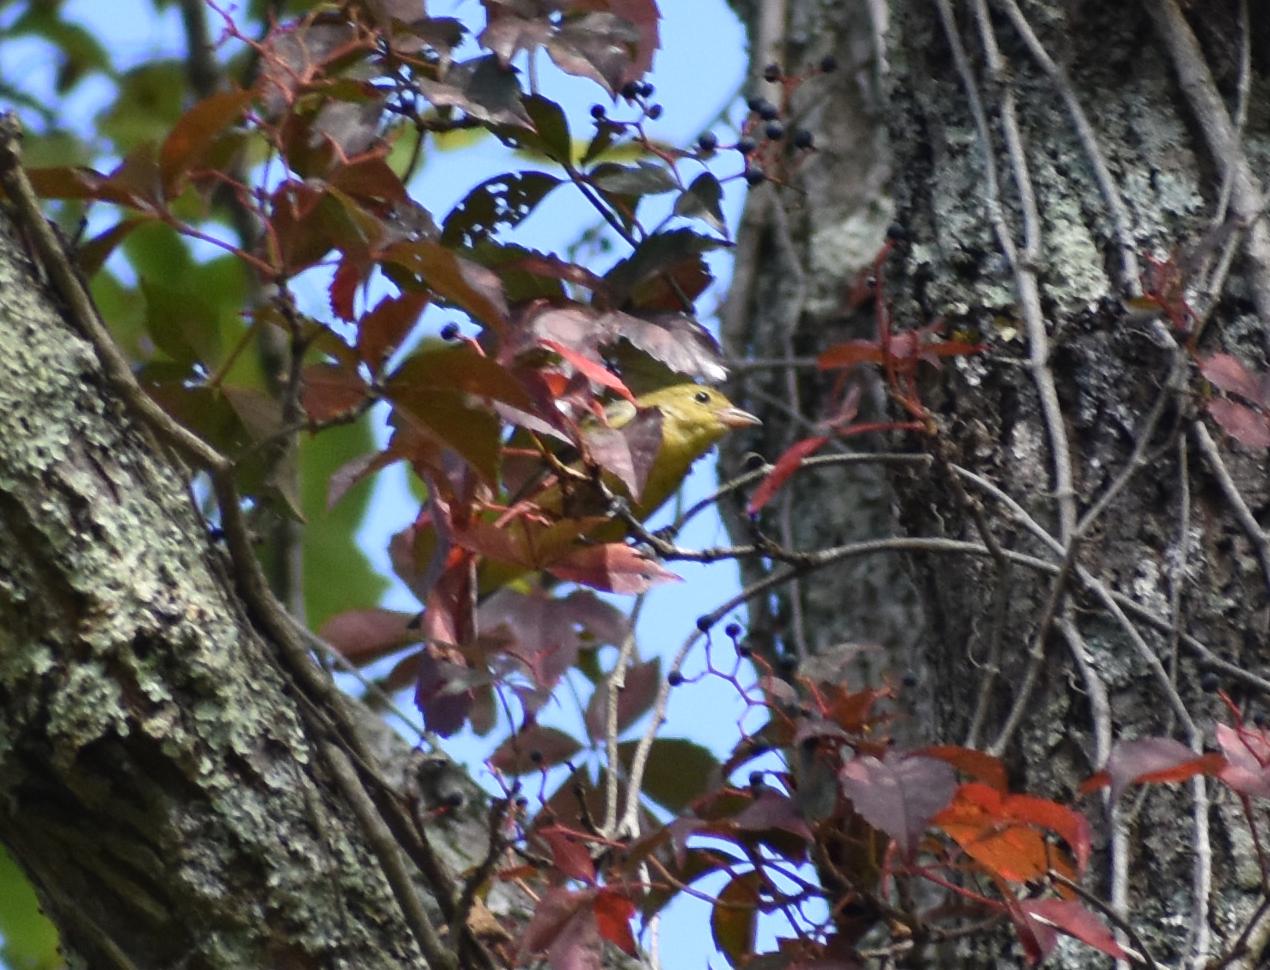 Scarlet Tanager eating Virginia Creeper berries